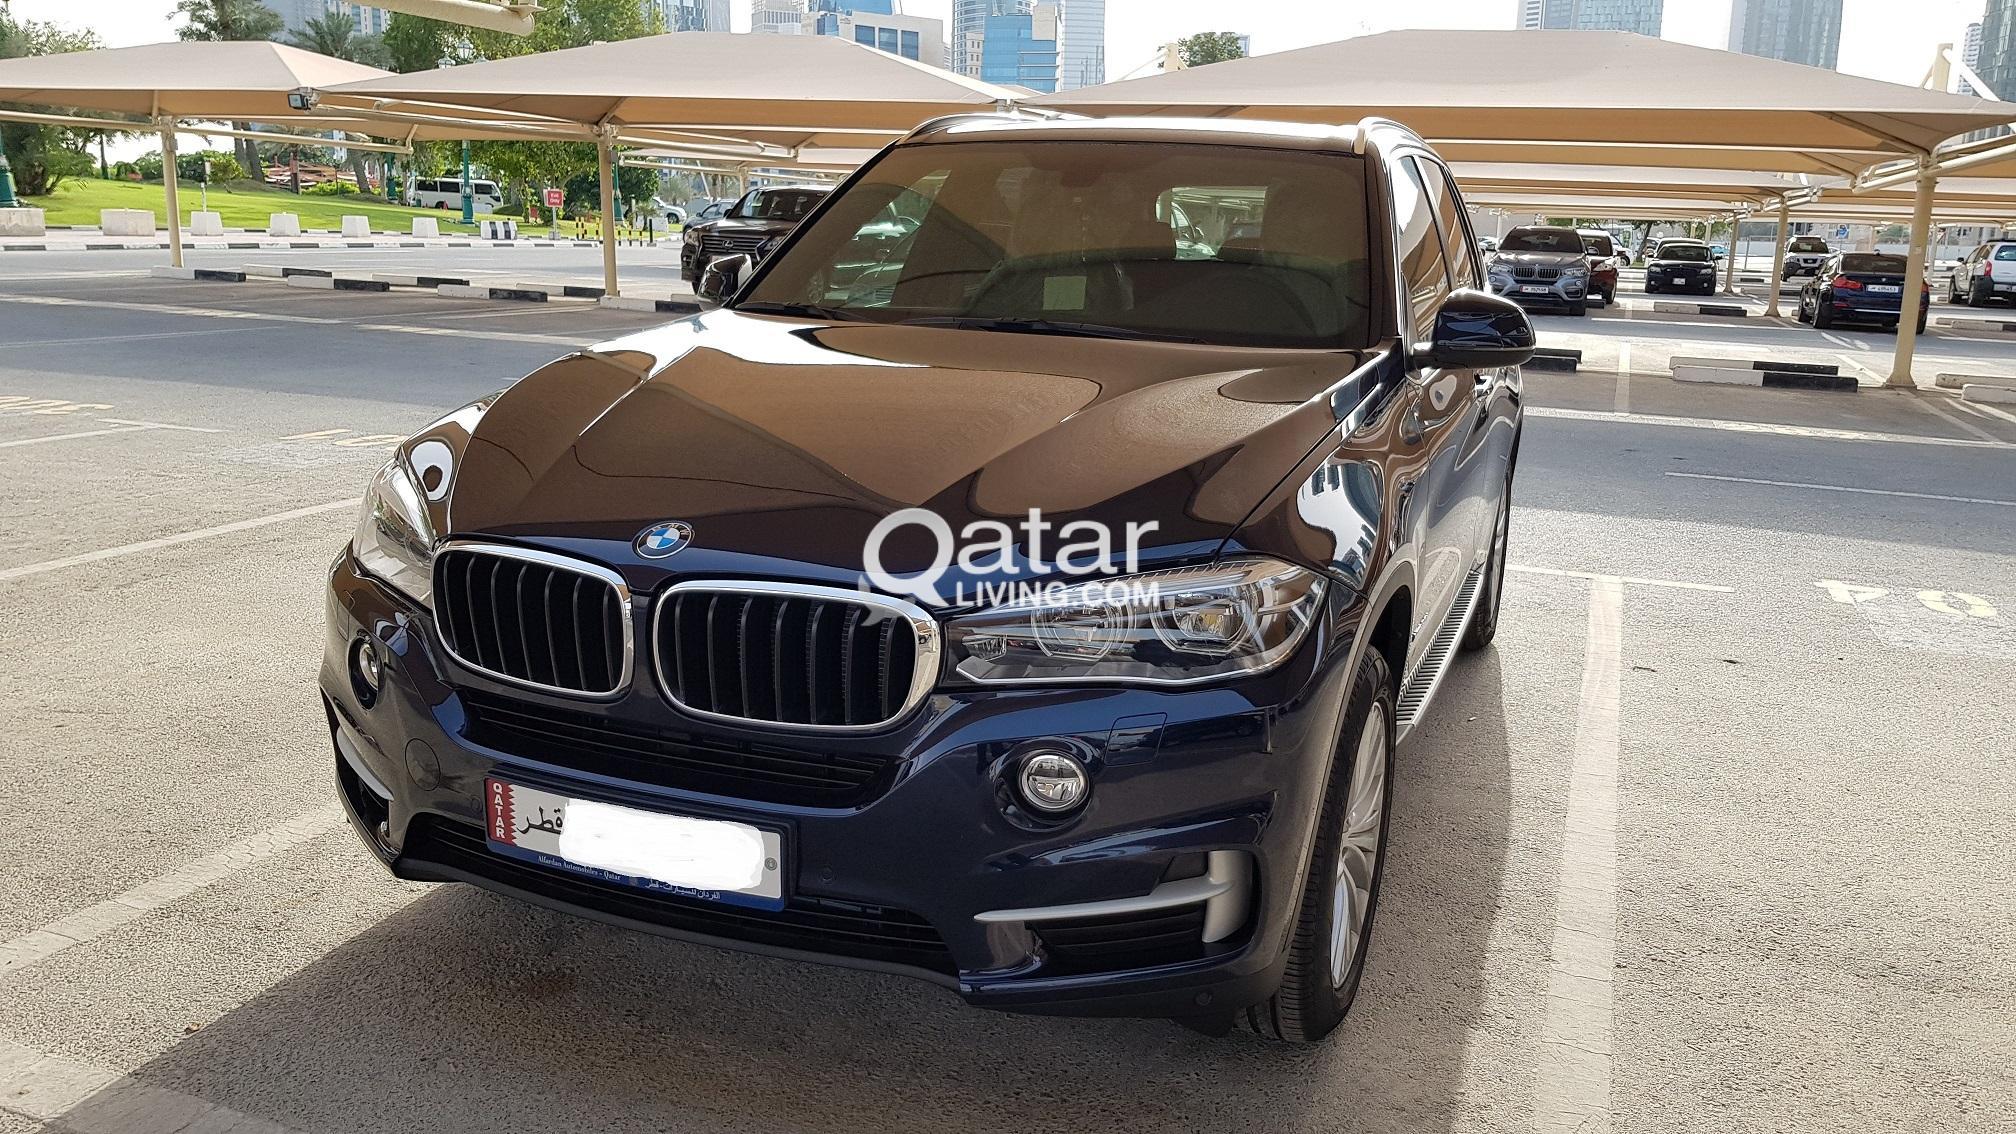 bmw 2018, including warranty/service pkg, condition-new | qatar living